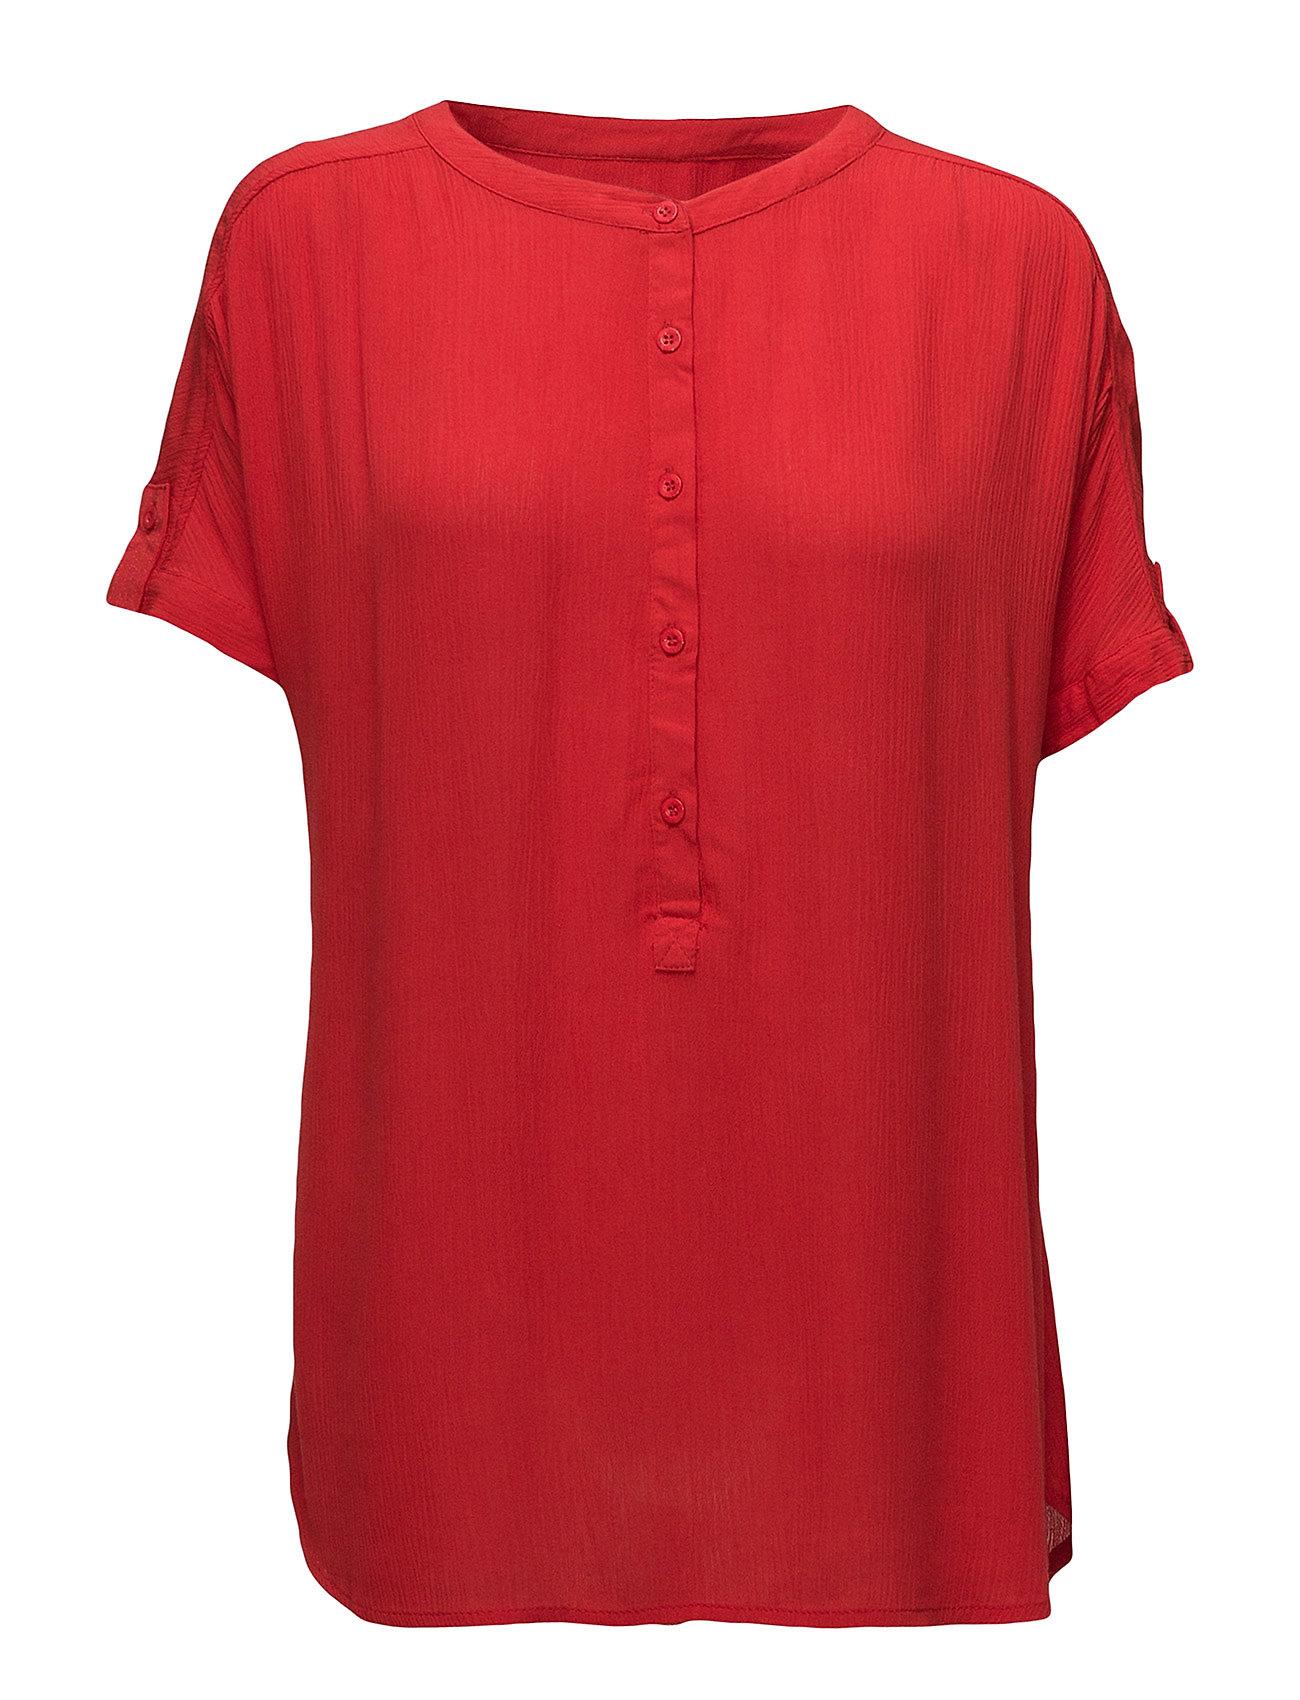 Image of Shirts T-shirt Top Rød Signal (3014359945)